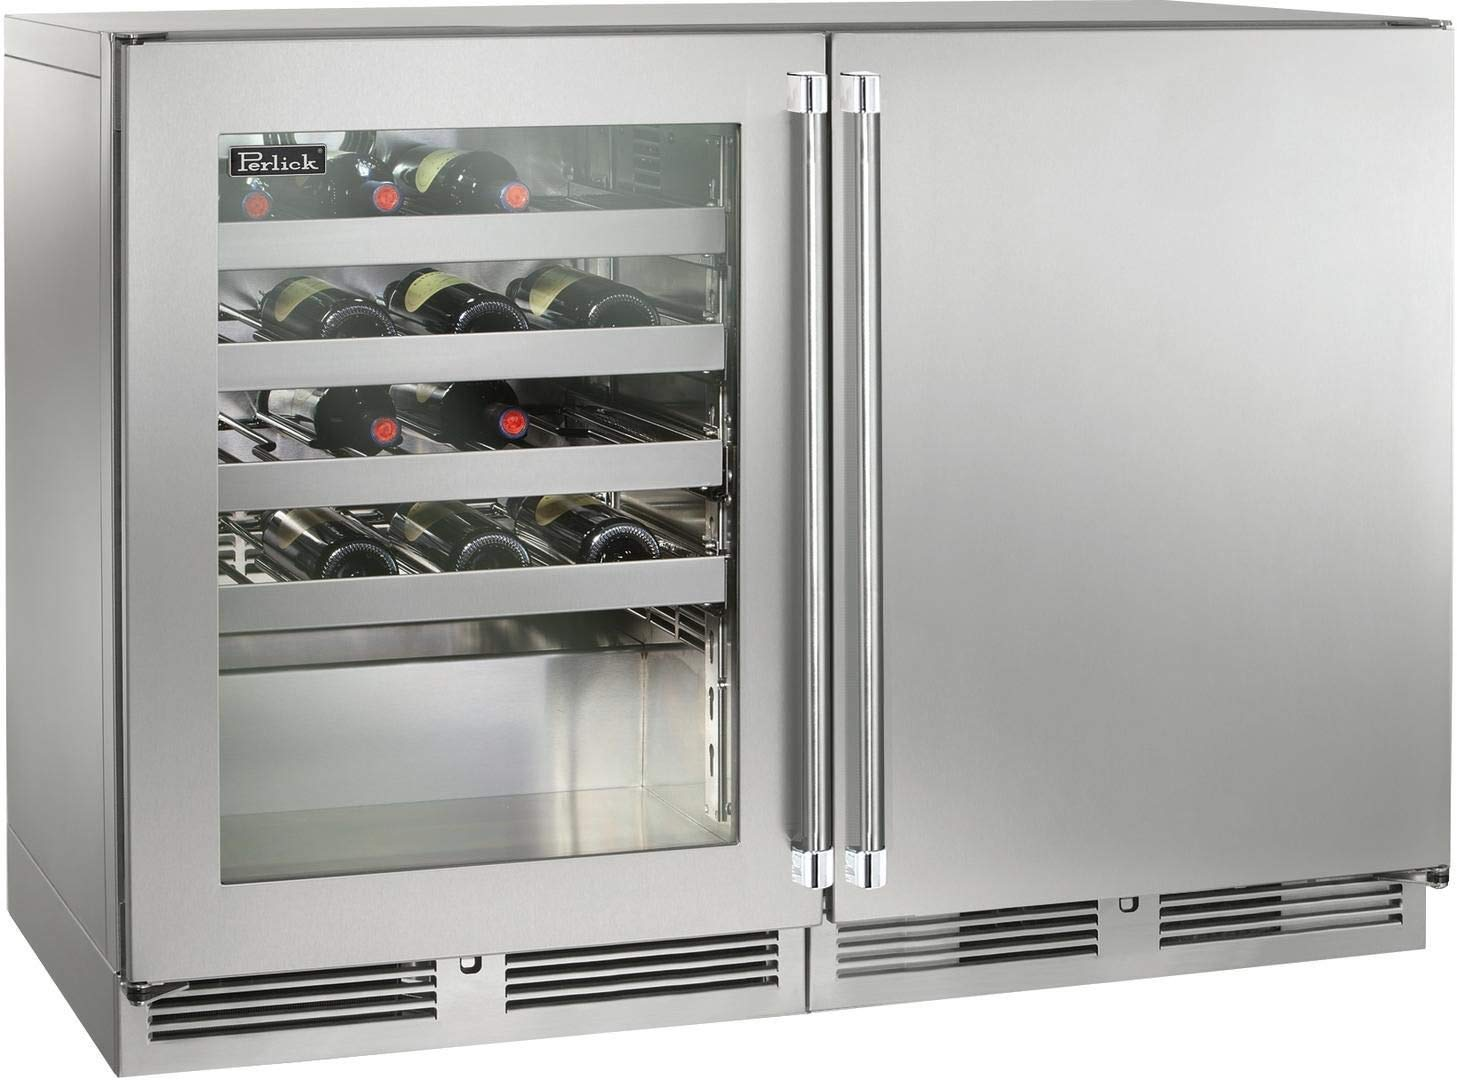 Perlick Signature Series 48 Inch Built-in Wine Cooler